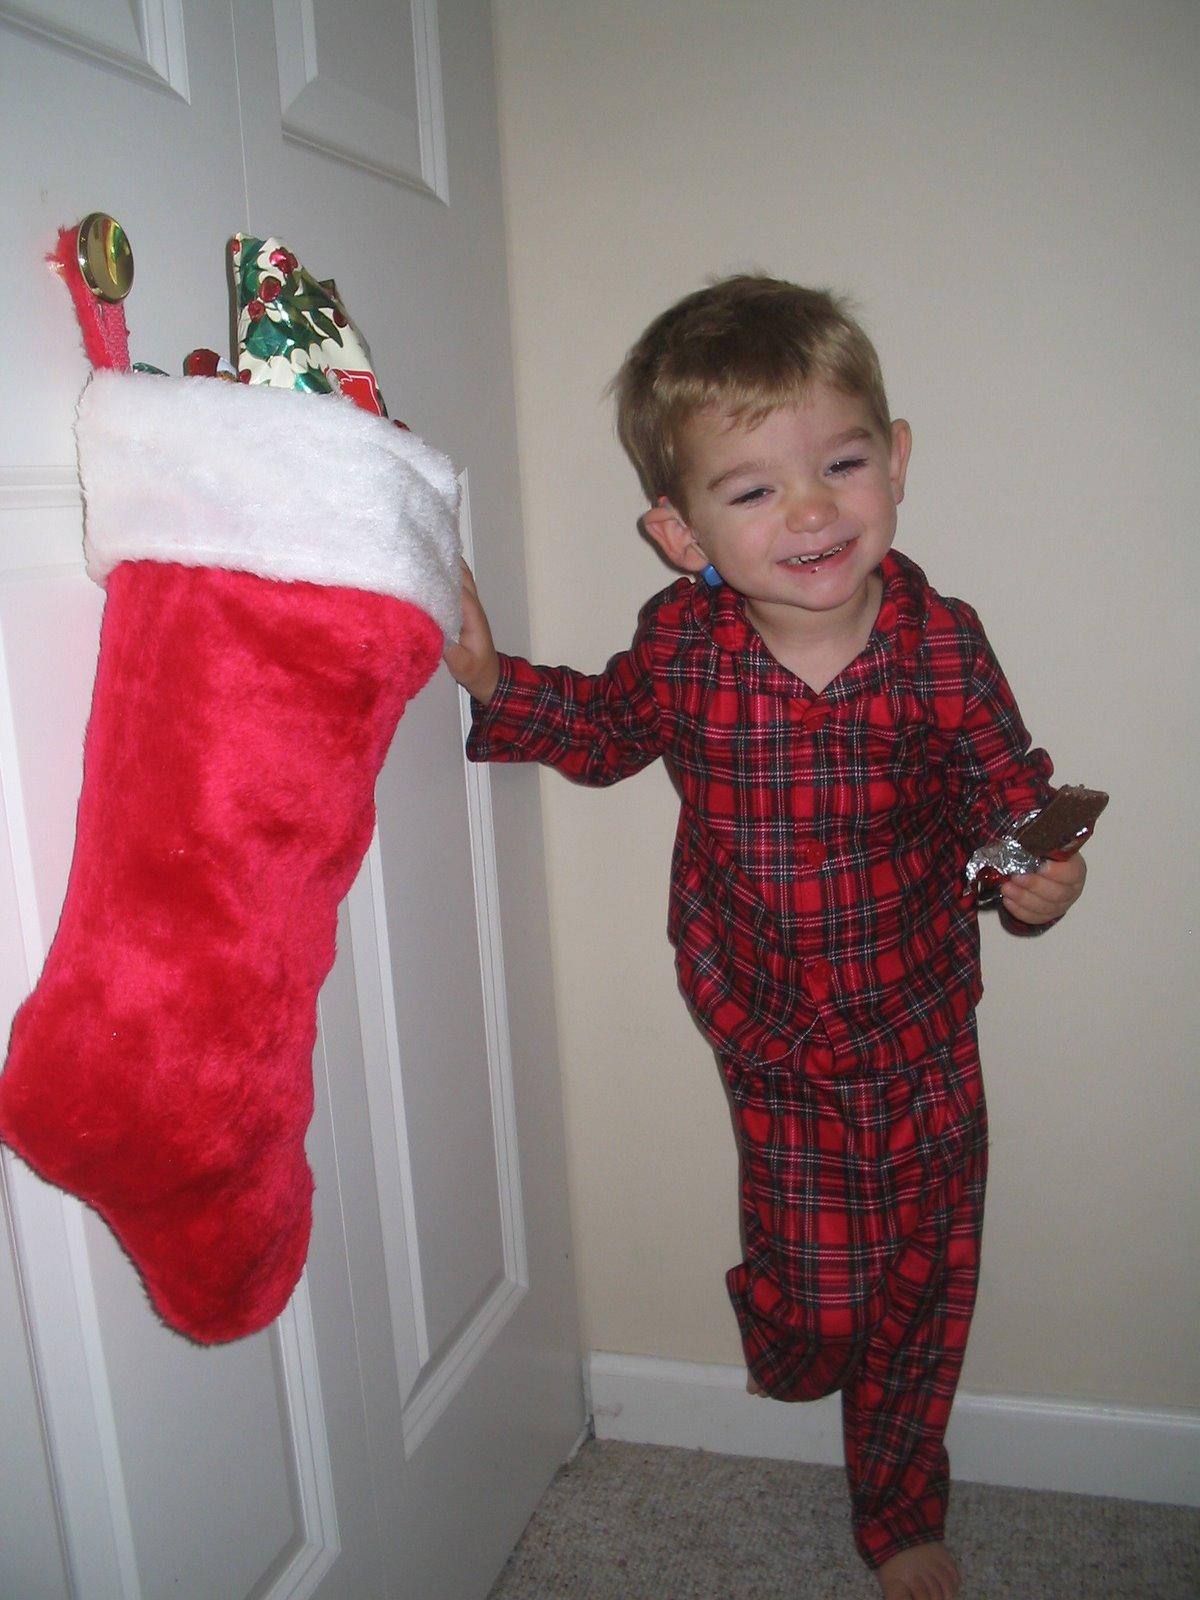 [Isaac+Christmas+2+2007.jpg]